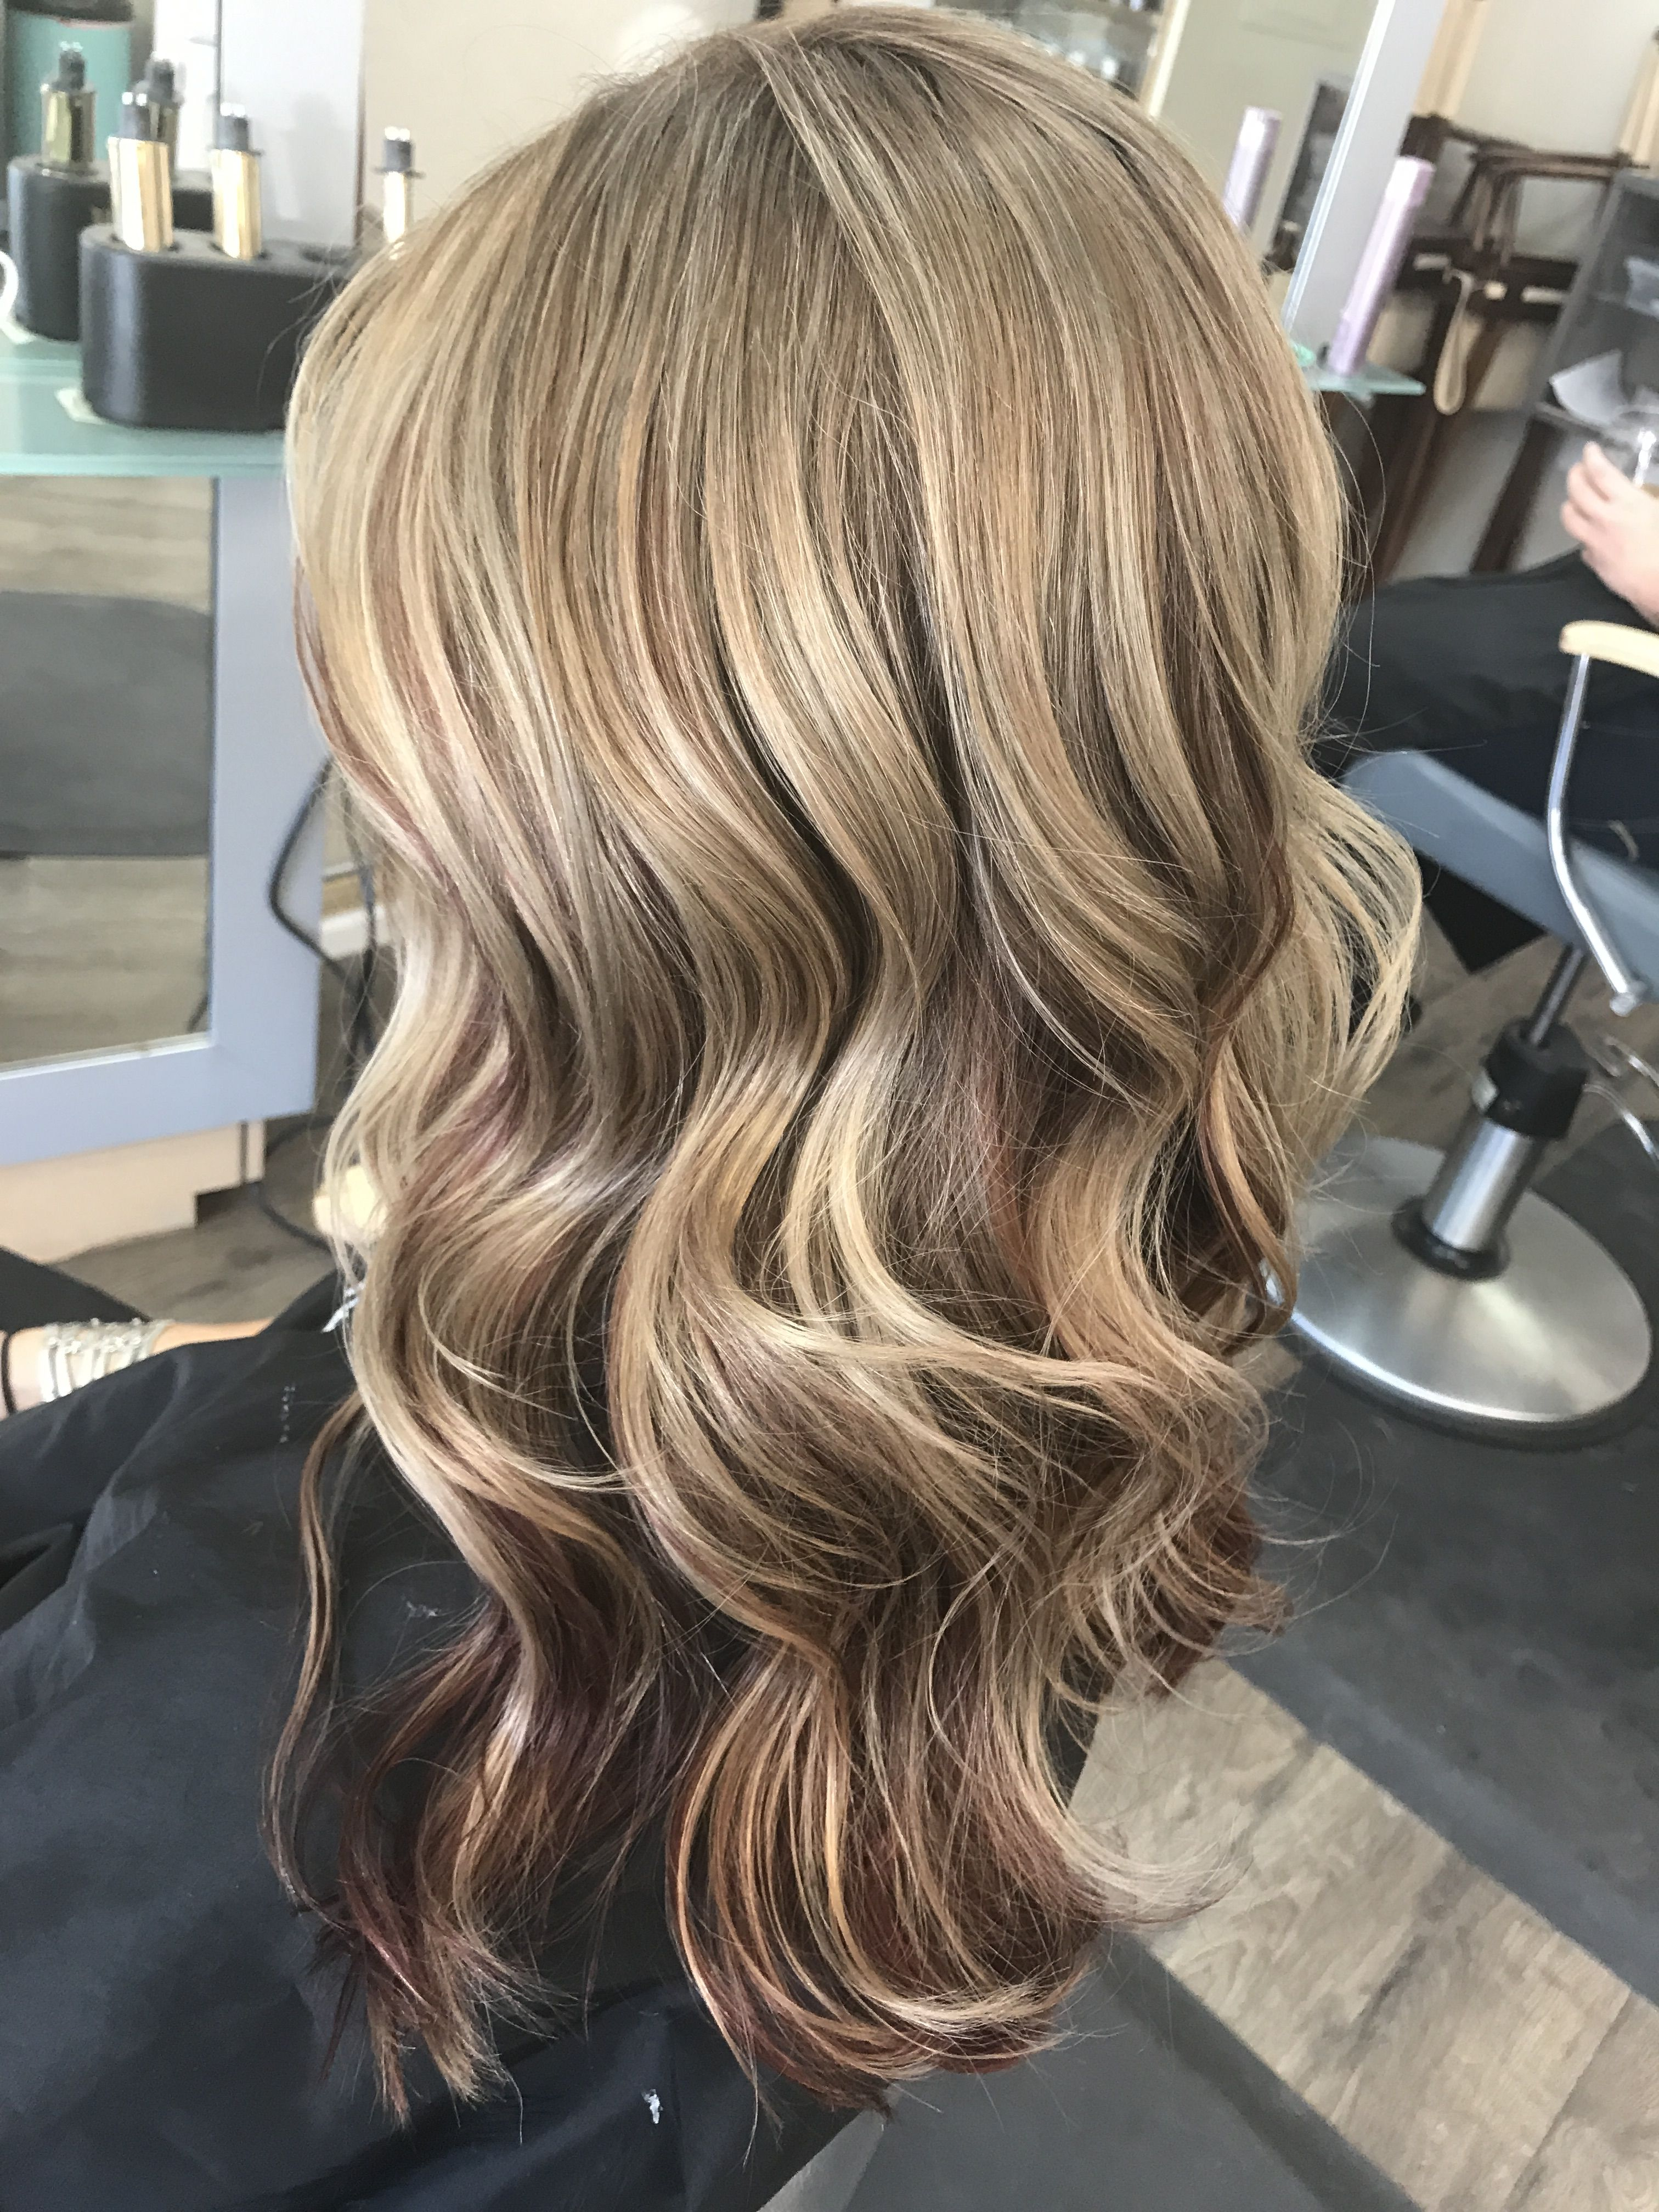 Balayage Beauty Rah Hair Studio South Lake Tahoe Ca My Hair Work